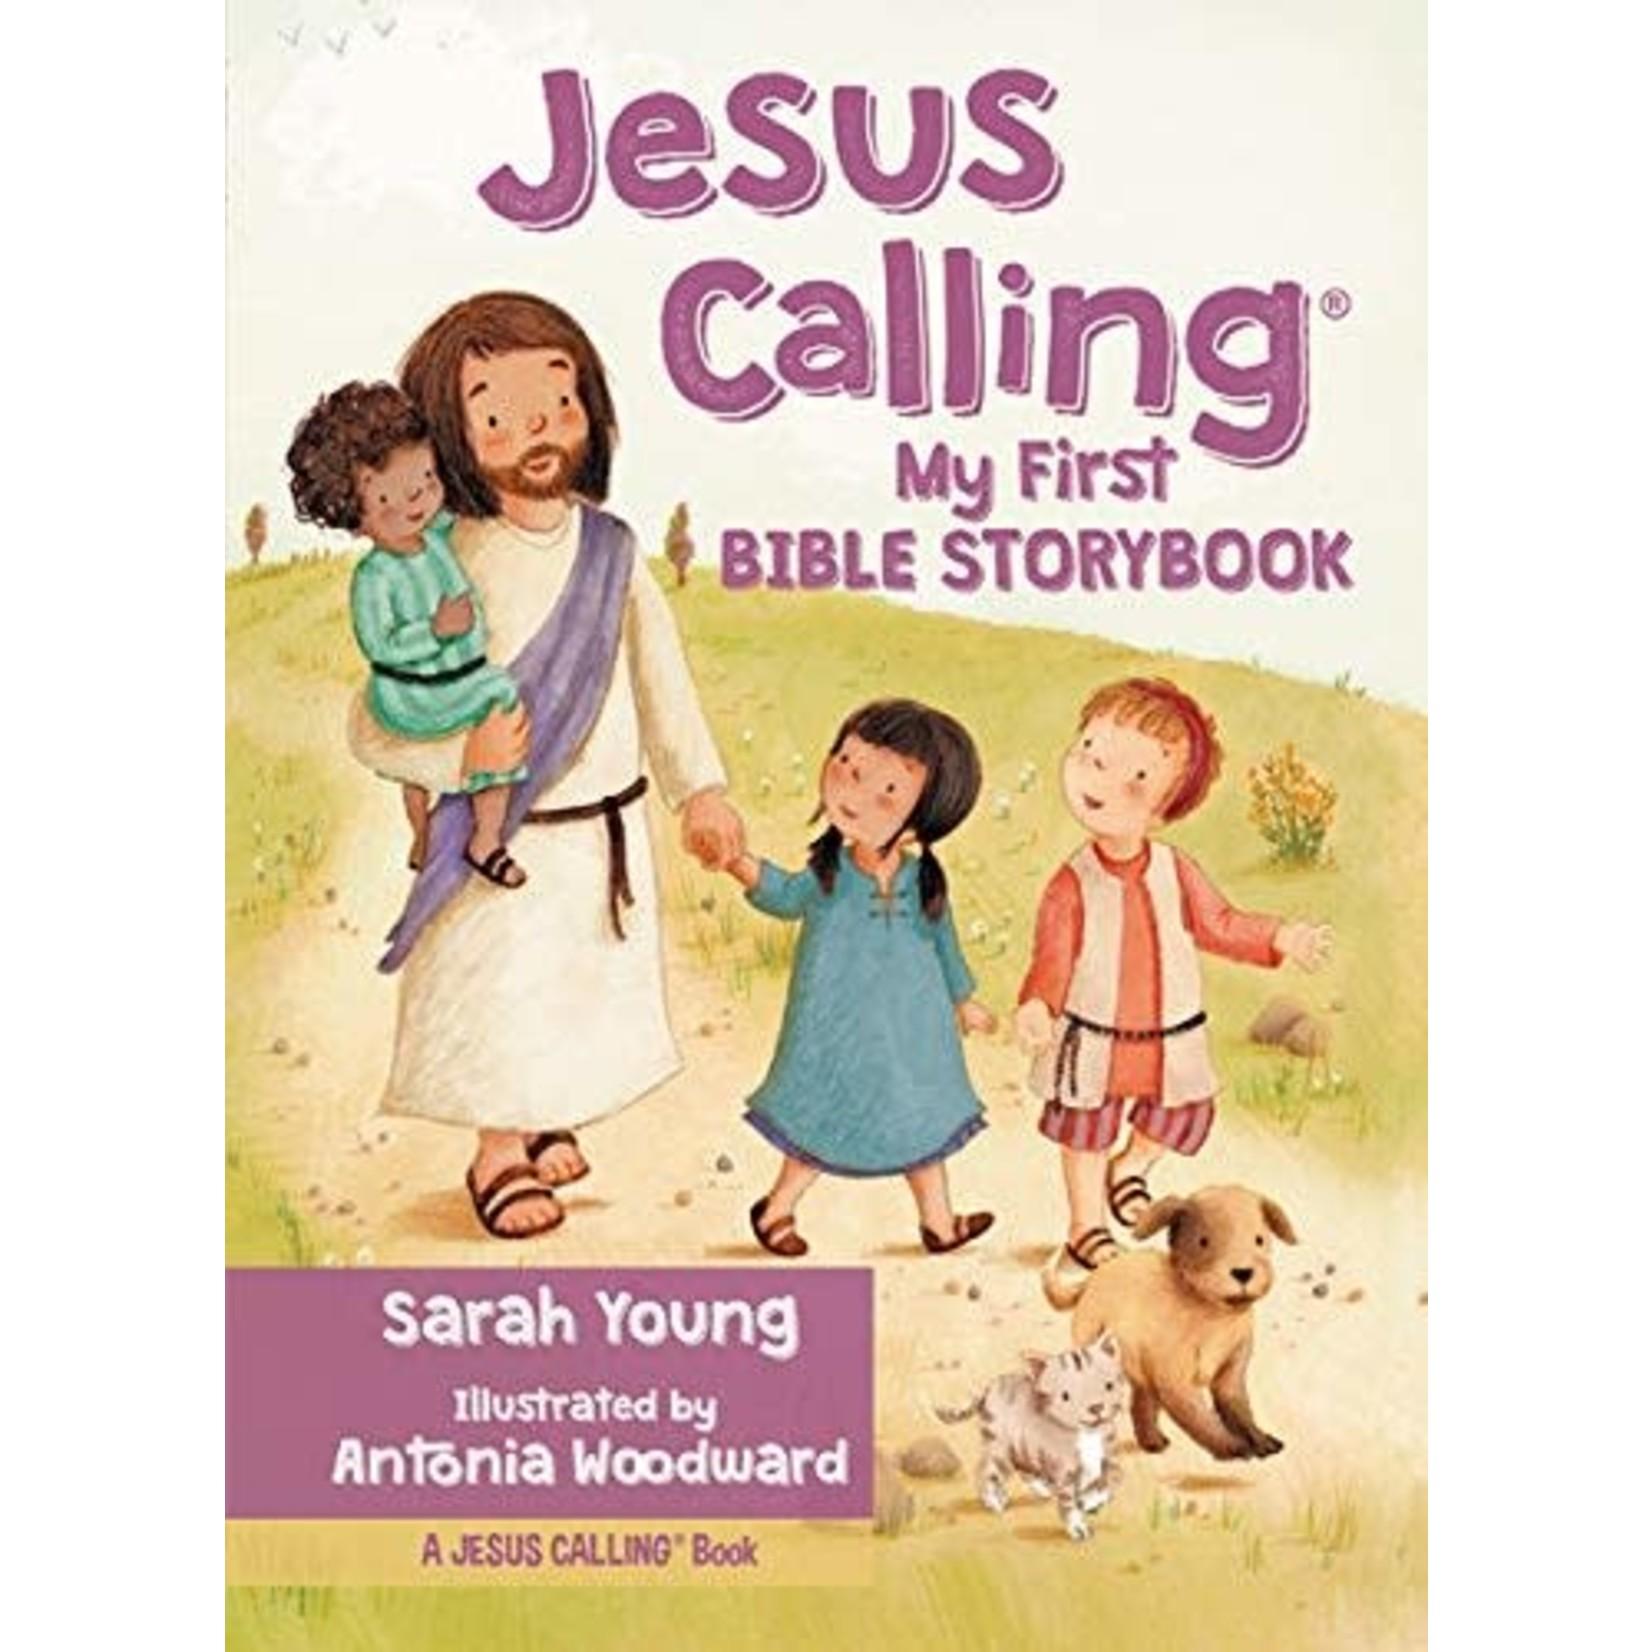 Jesus Calling First Bible Storybook